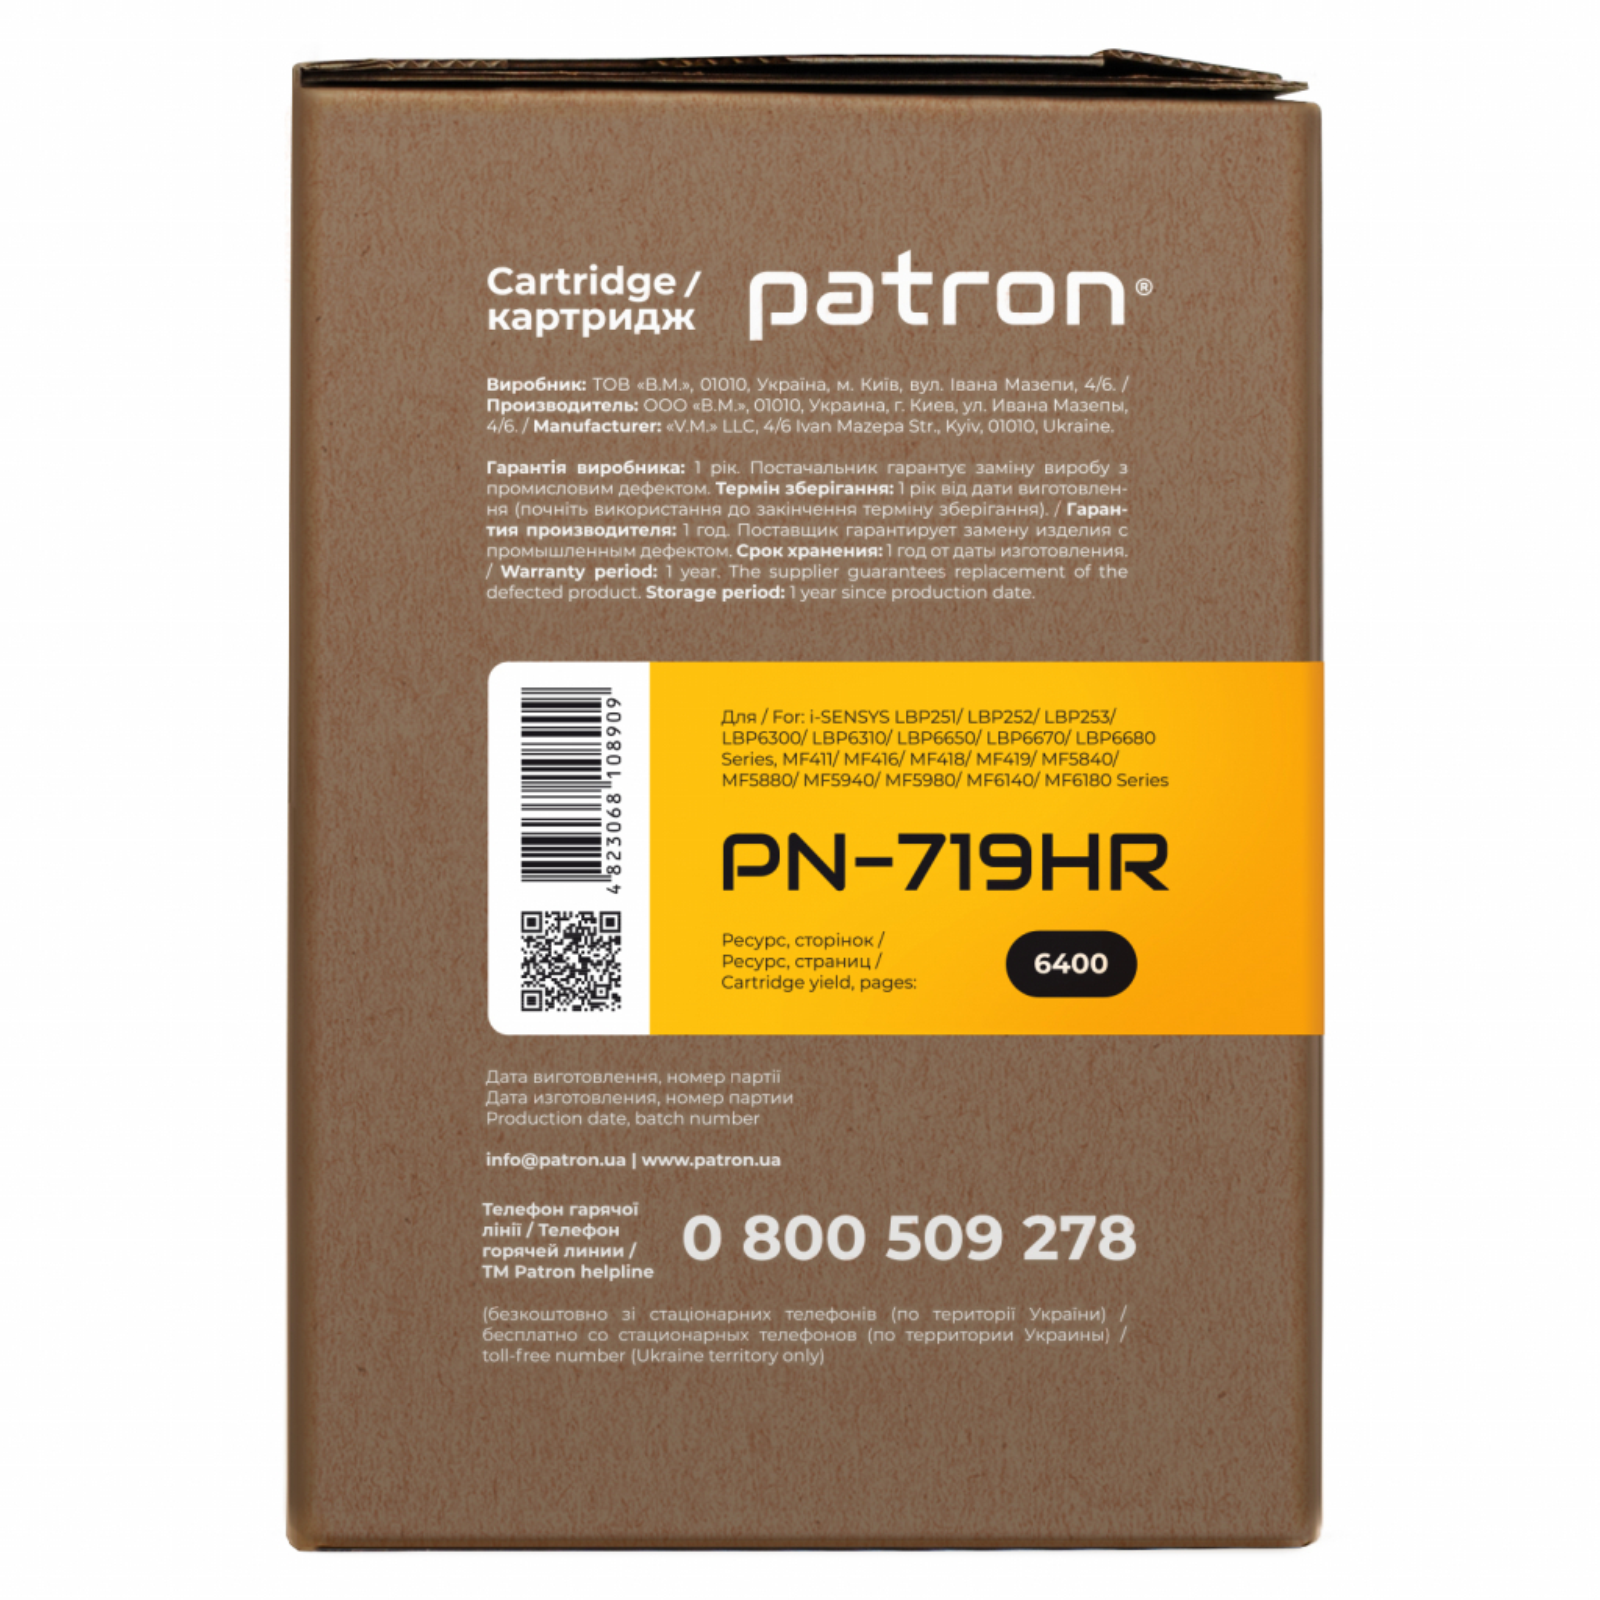 Картридж PATRON CANON 719H Extra (PN-719HR) (CT-CAN-719H-PN-R) изображение 3